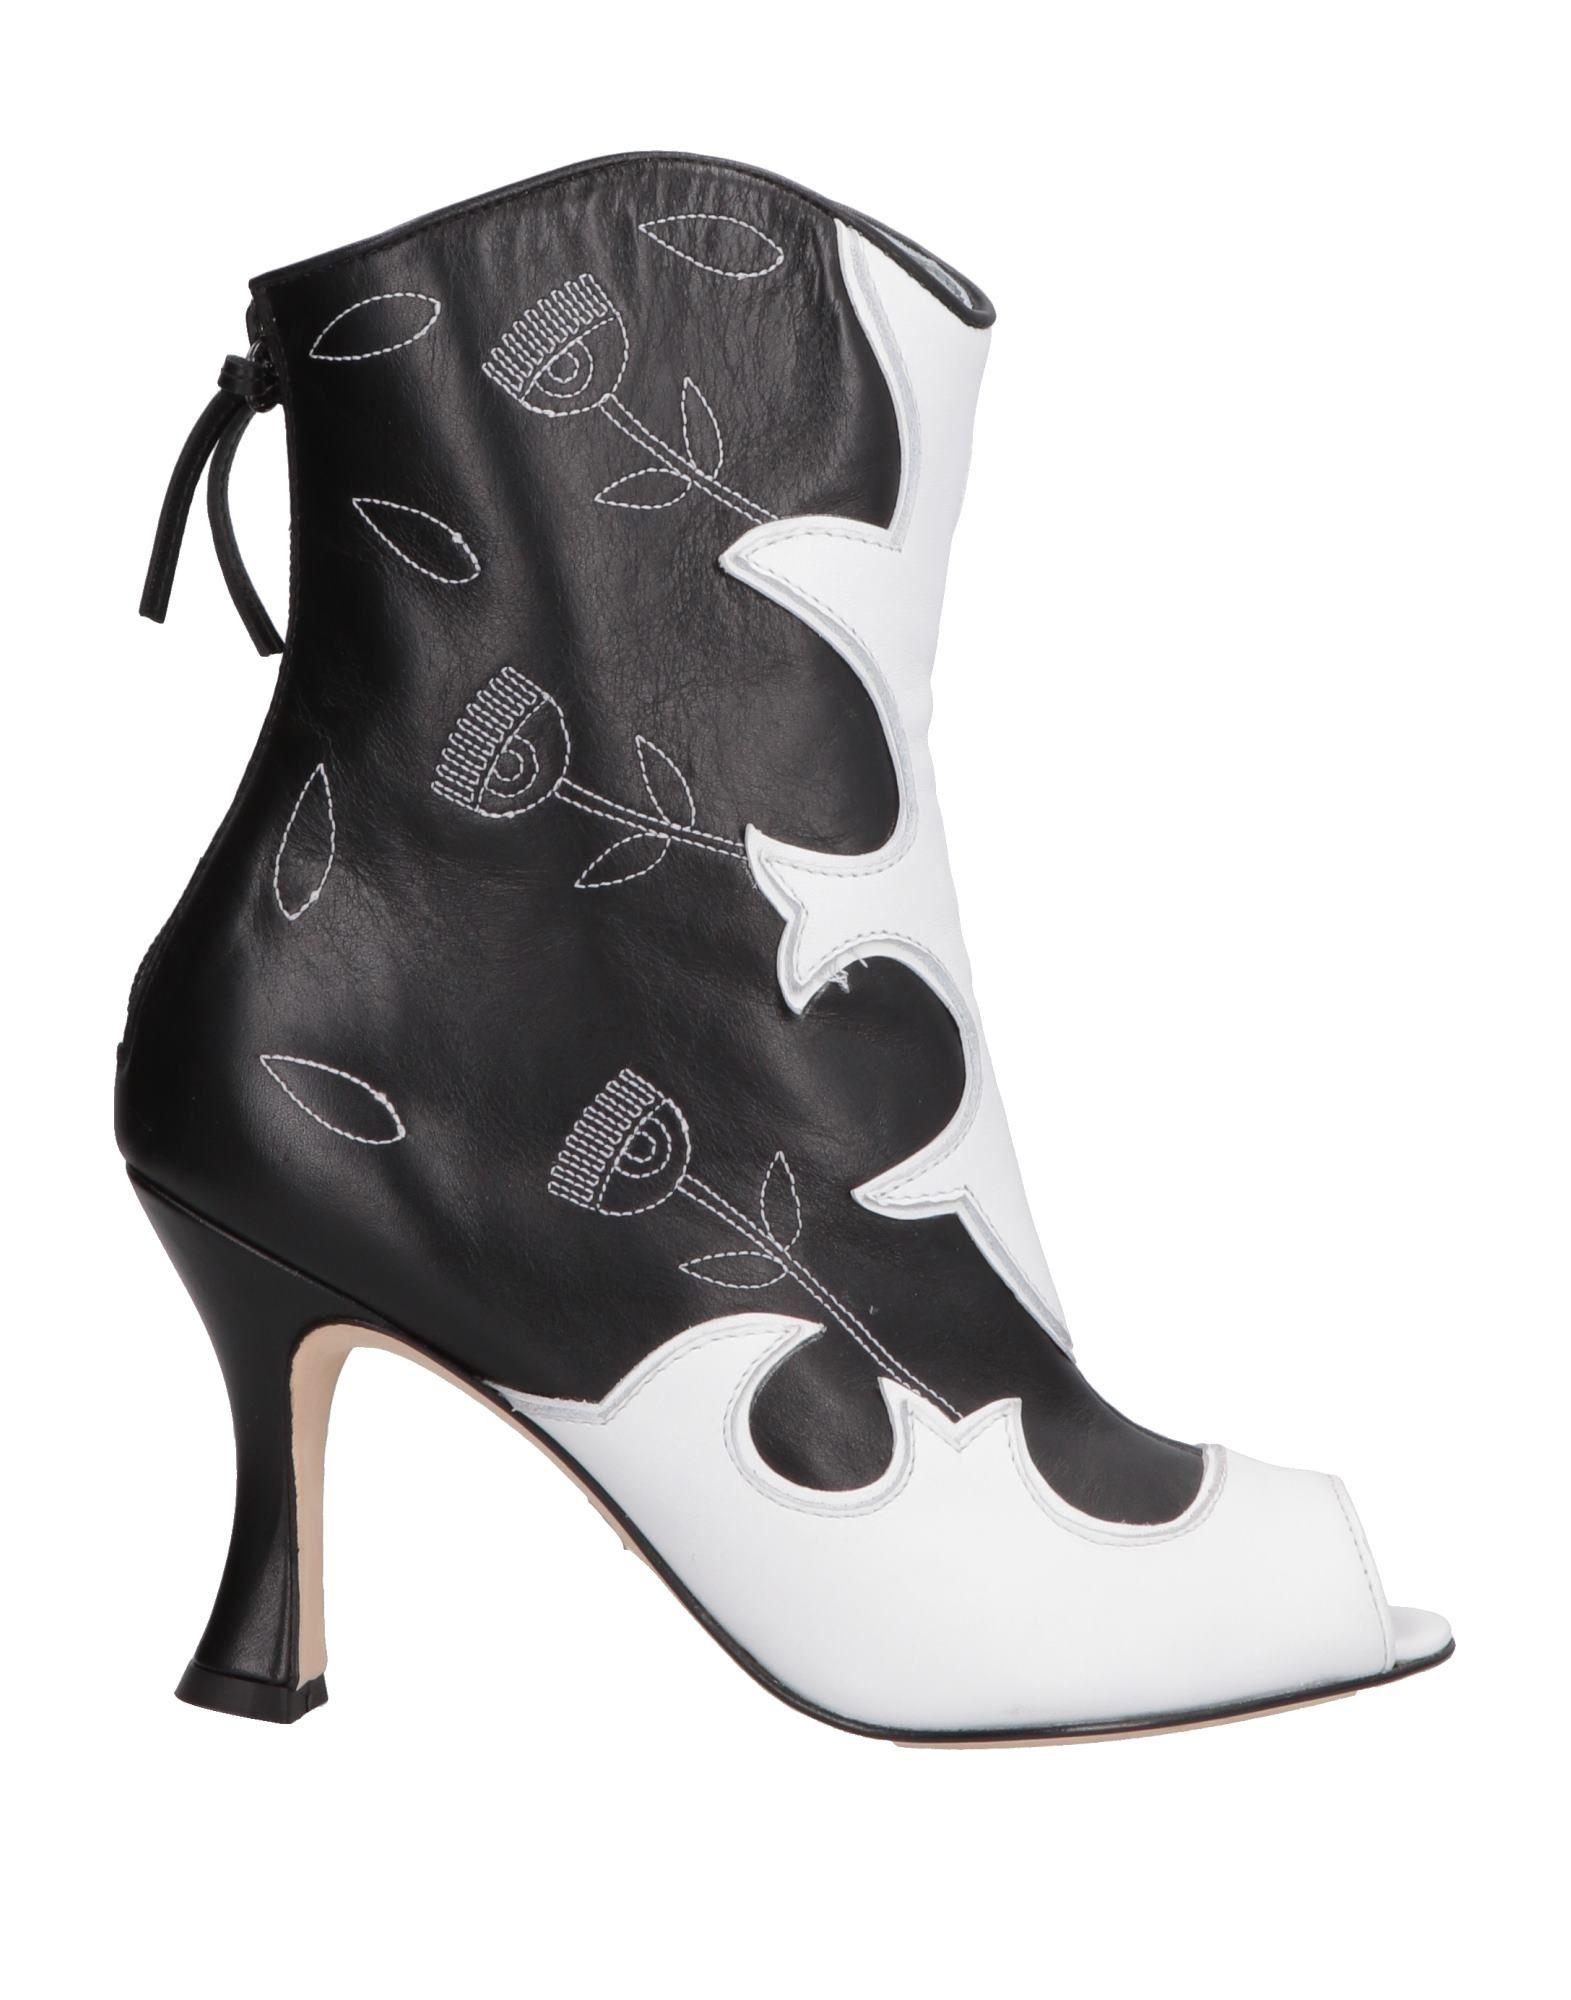 Chiara Ferragni Ankle Boot - Women Chiara Ferragni Ferragni Chiara Ankle Boots online on  Canada - 11556133BC f04125